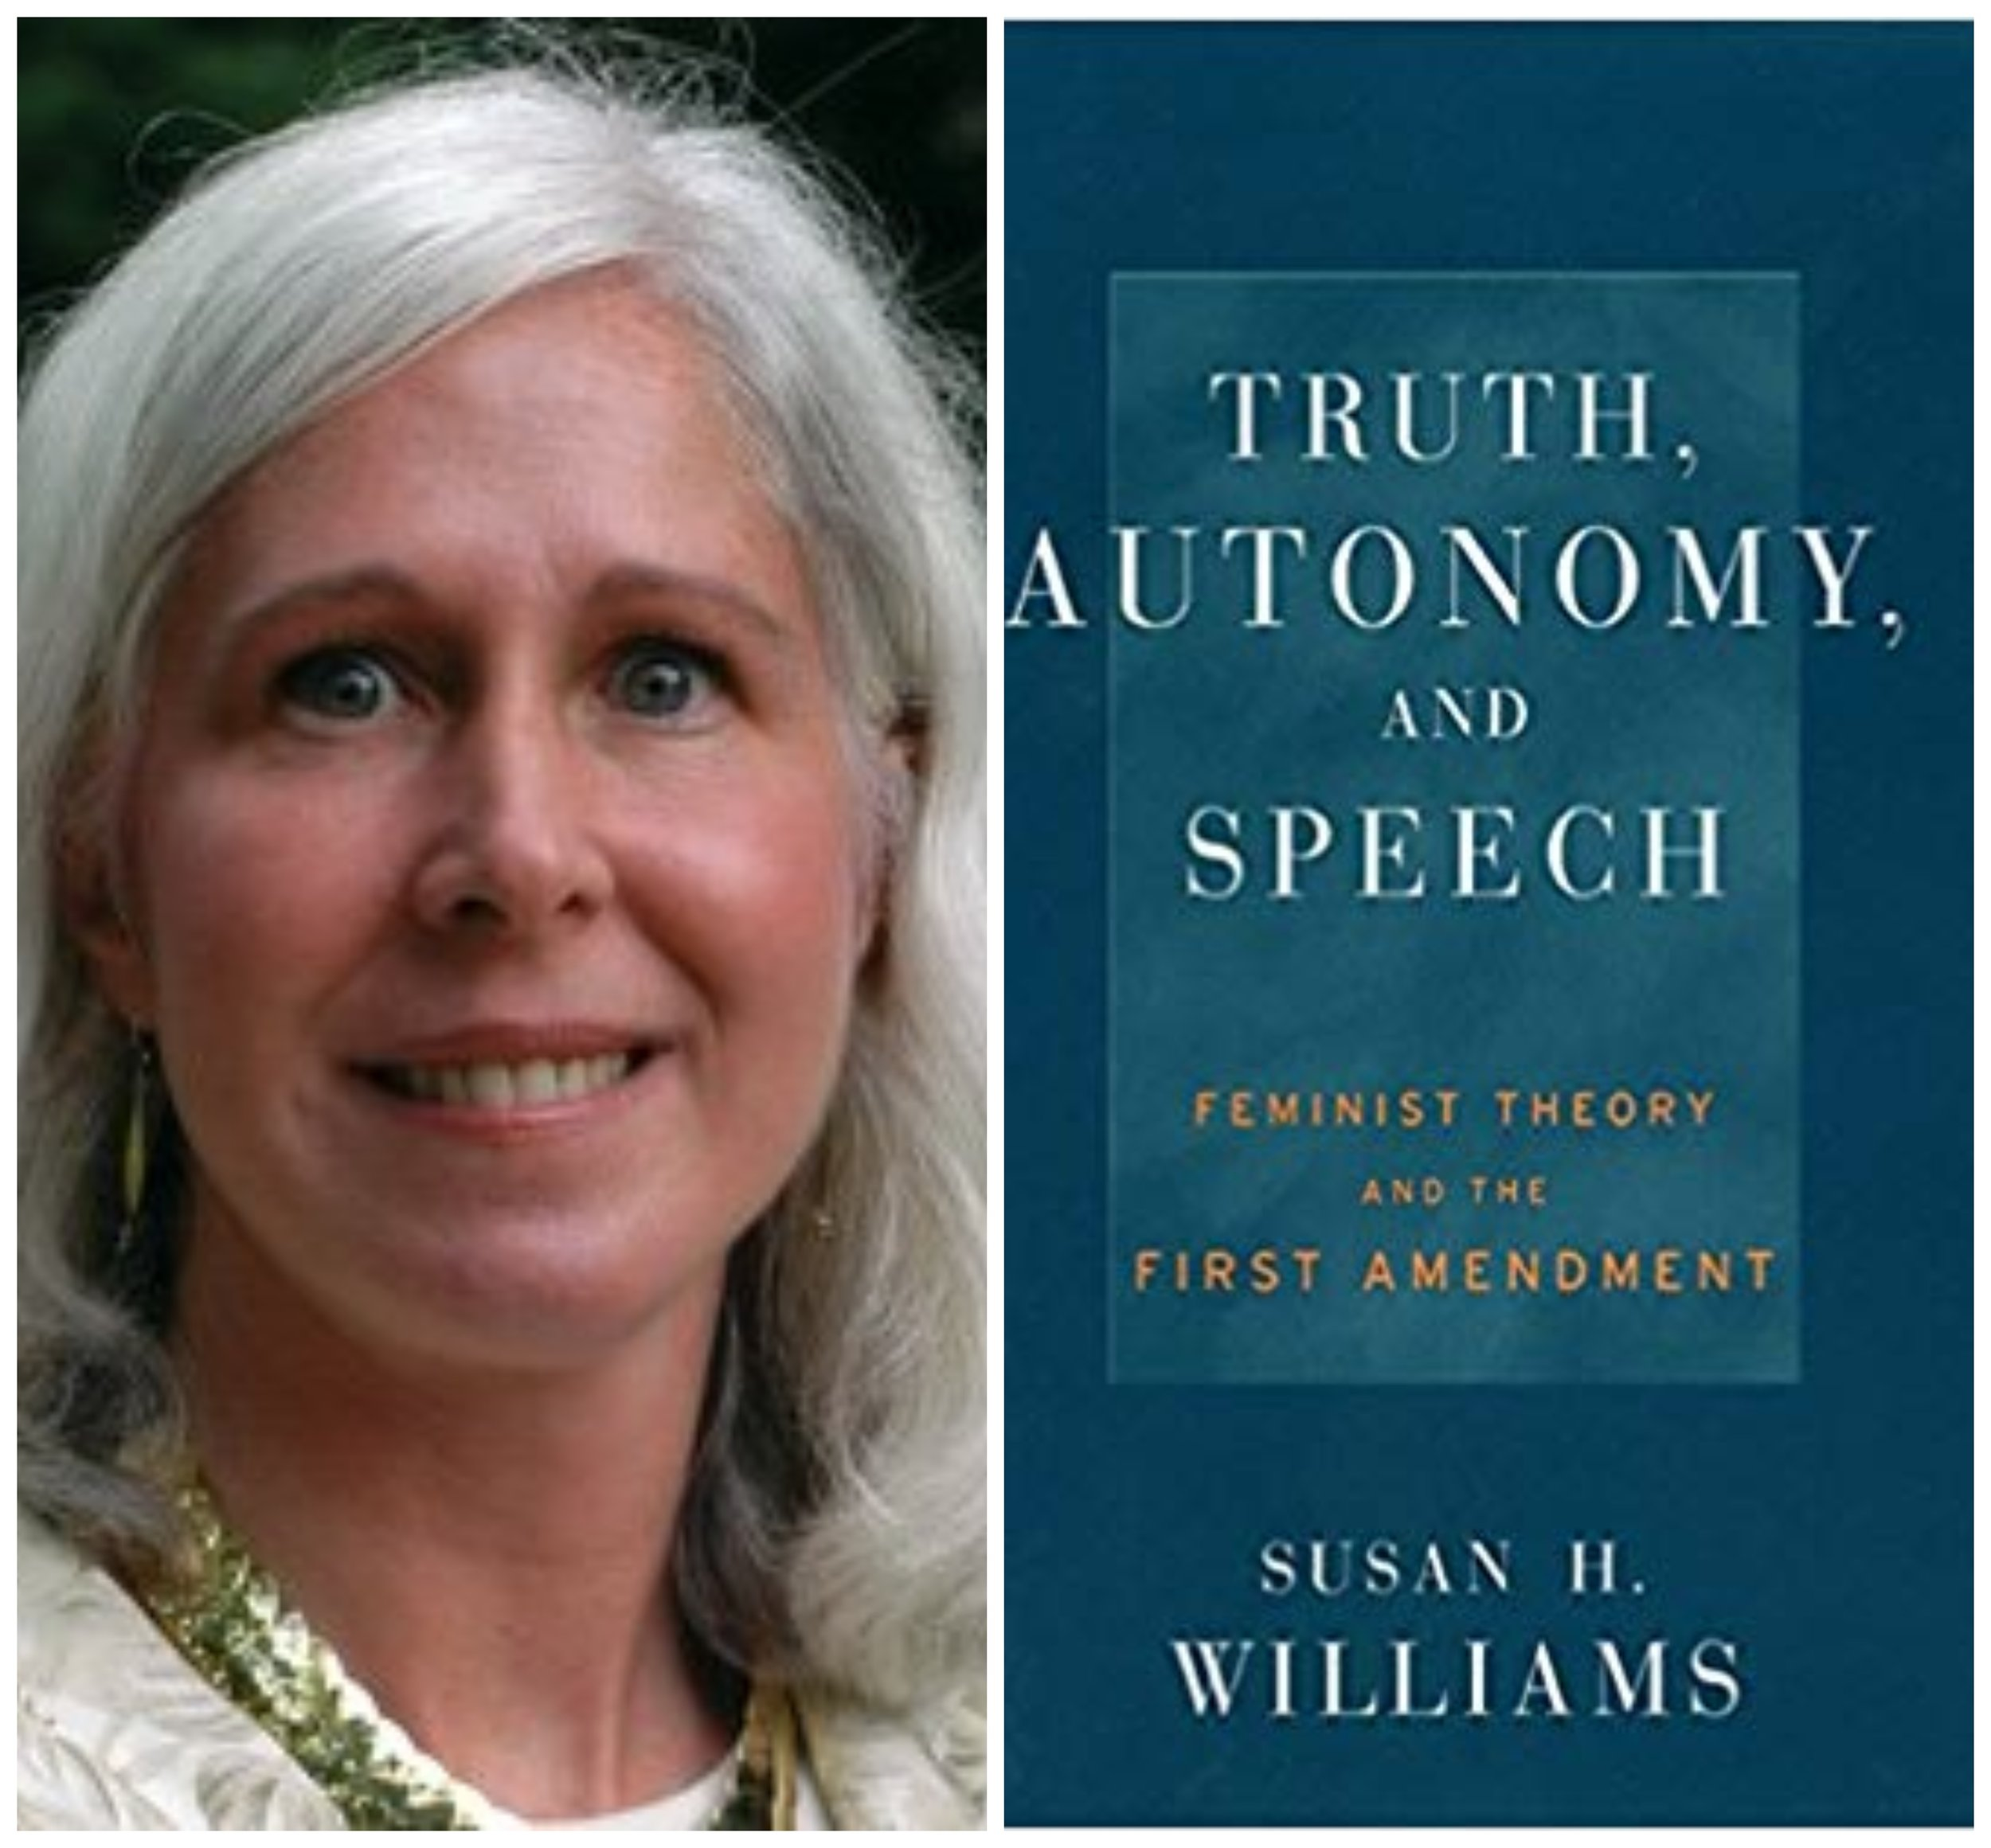 FREE SPEECH 48: Truth, Autonomy and Free Speech, with Susan Williams -